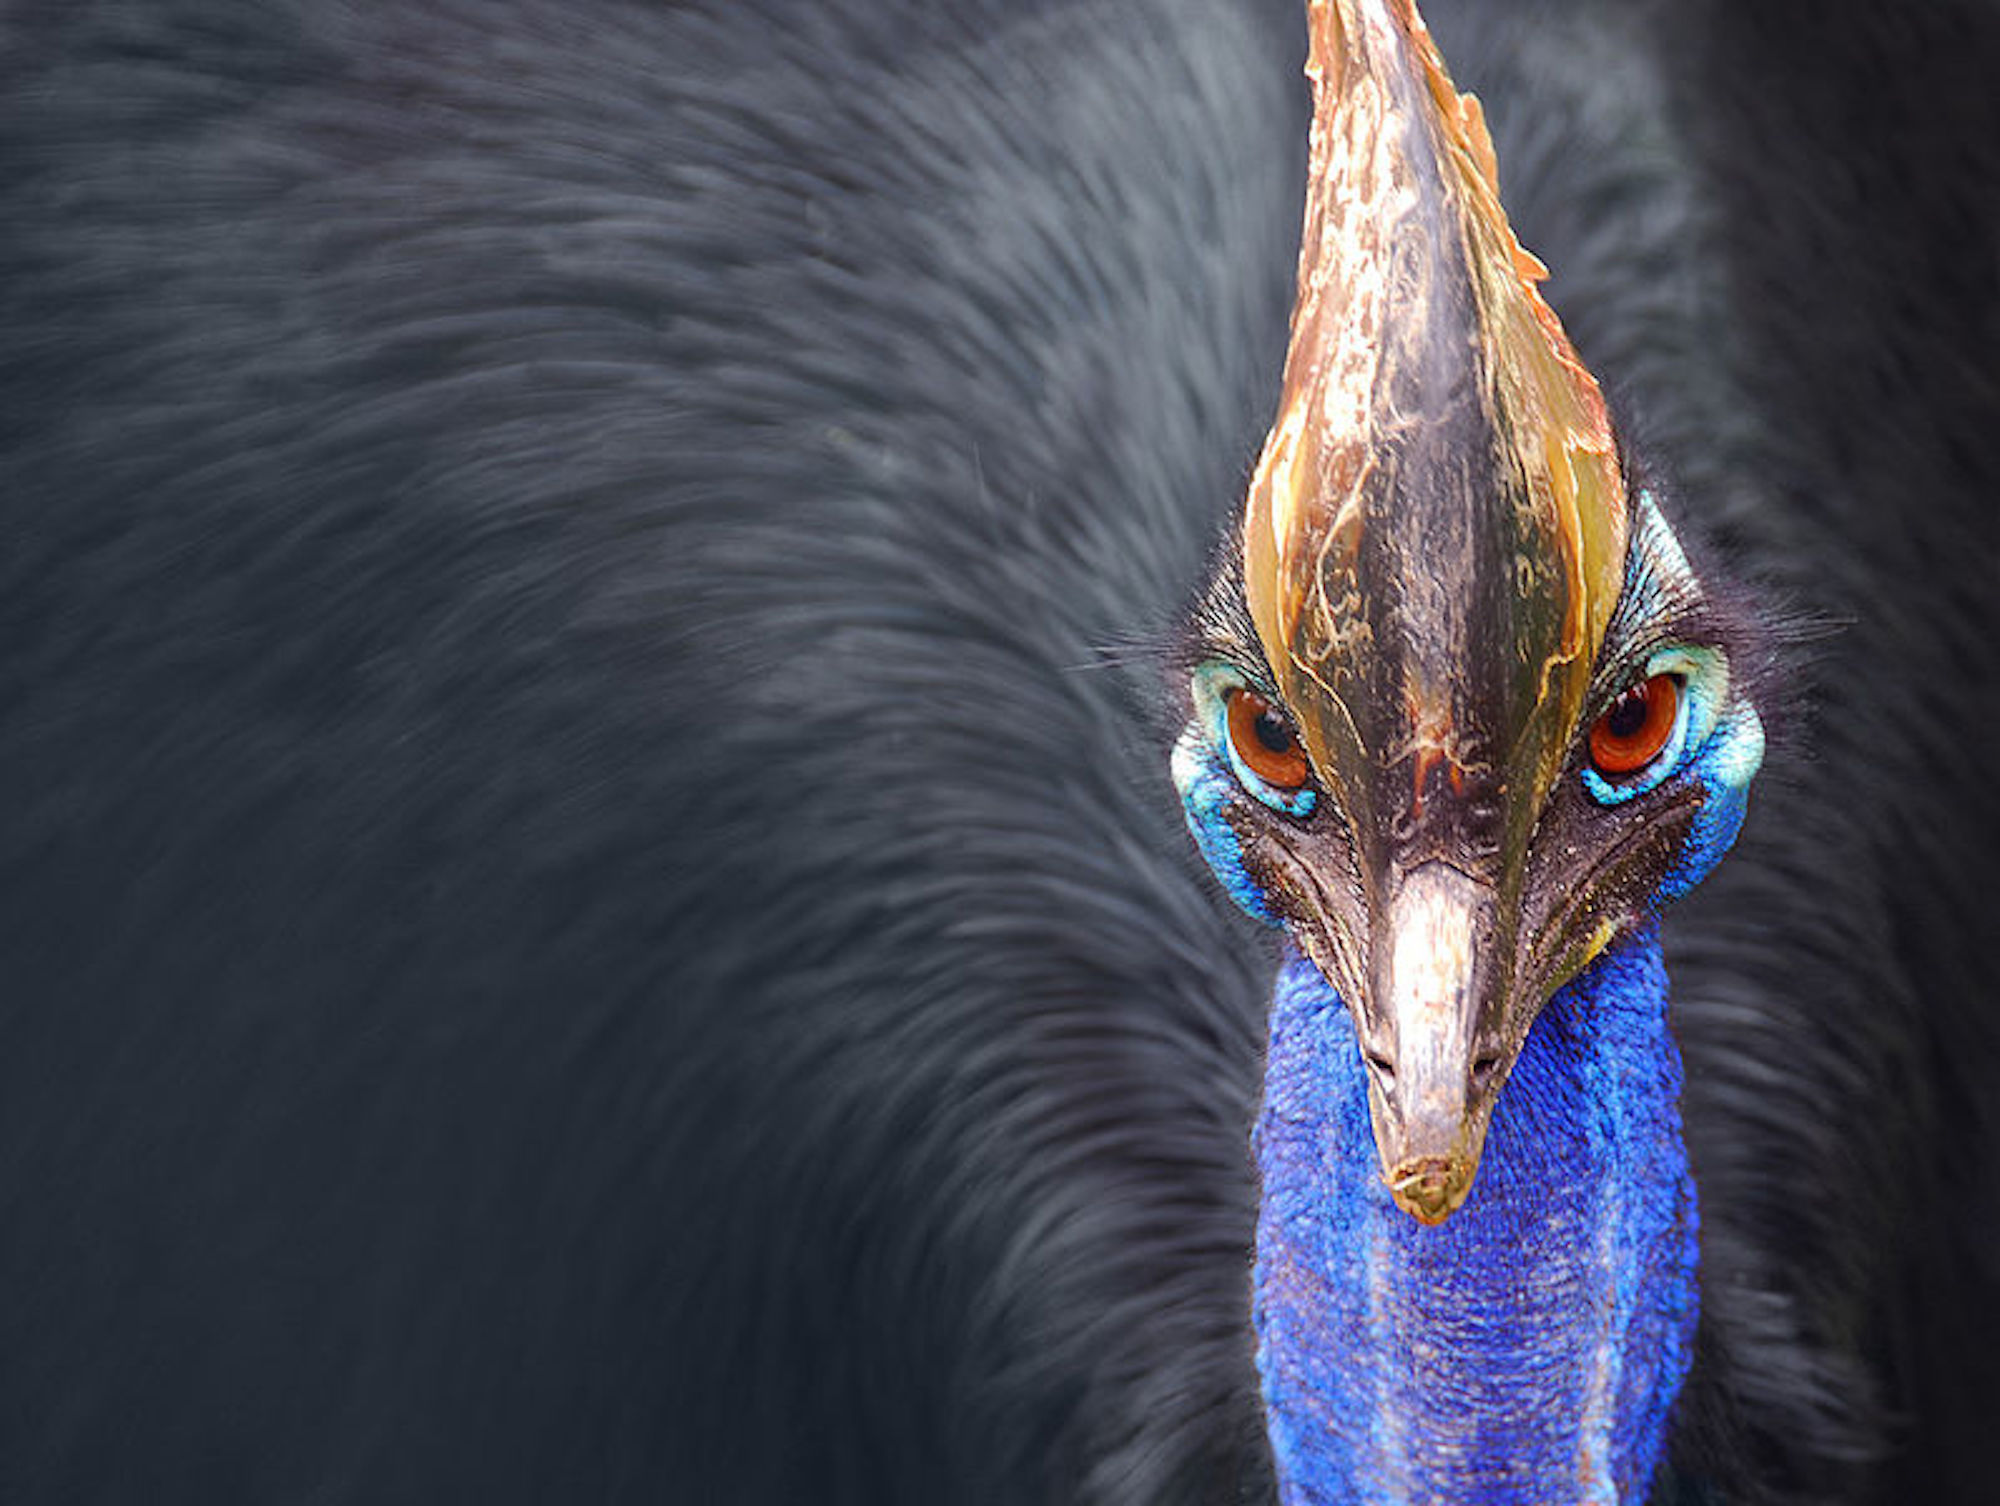 Kasuari Si Burung Paling Berbahaya Sedunia Kembali Menewaskan Manusia